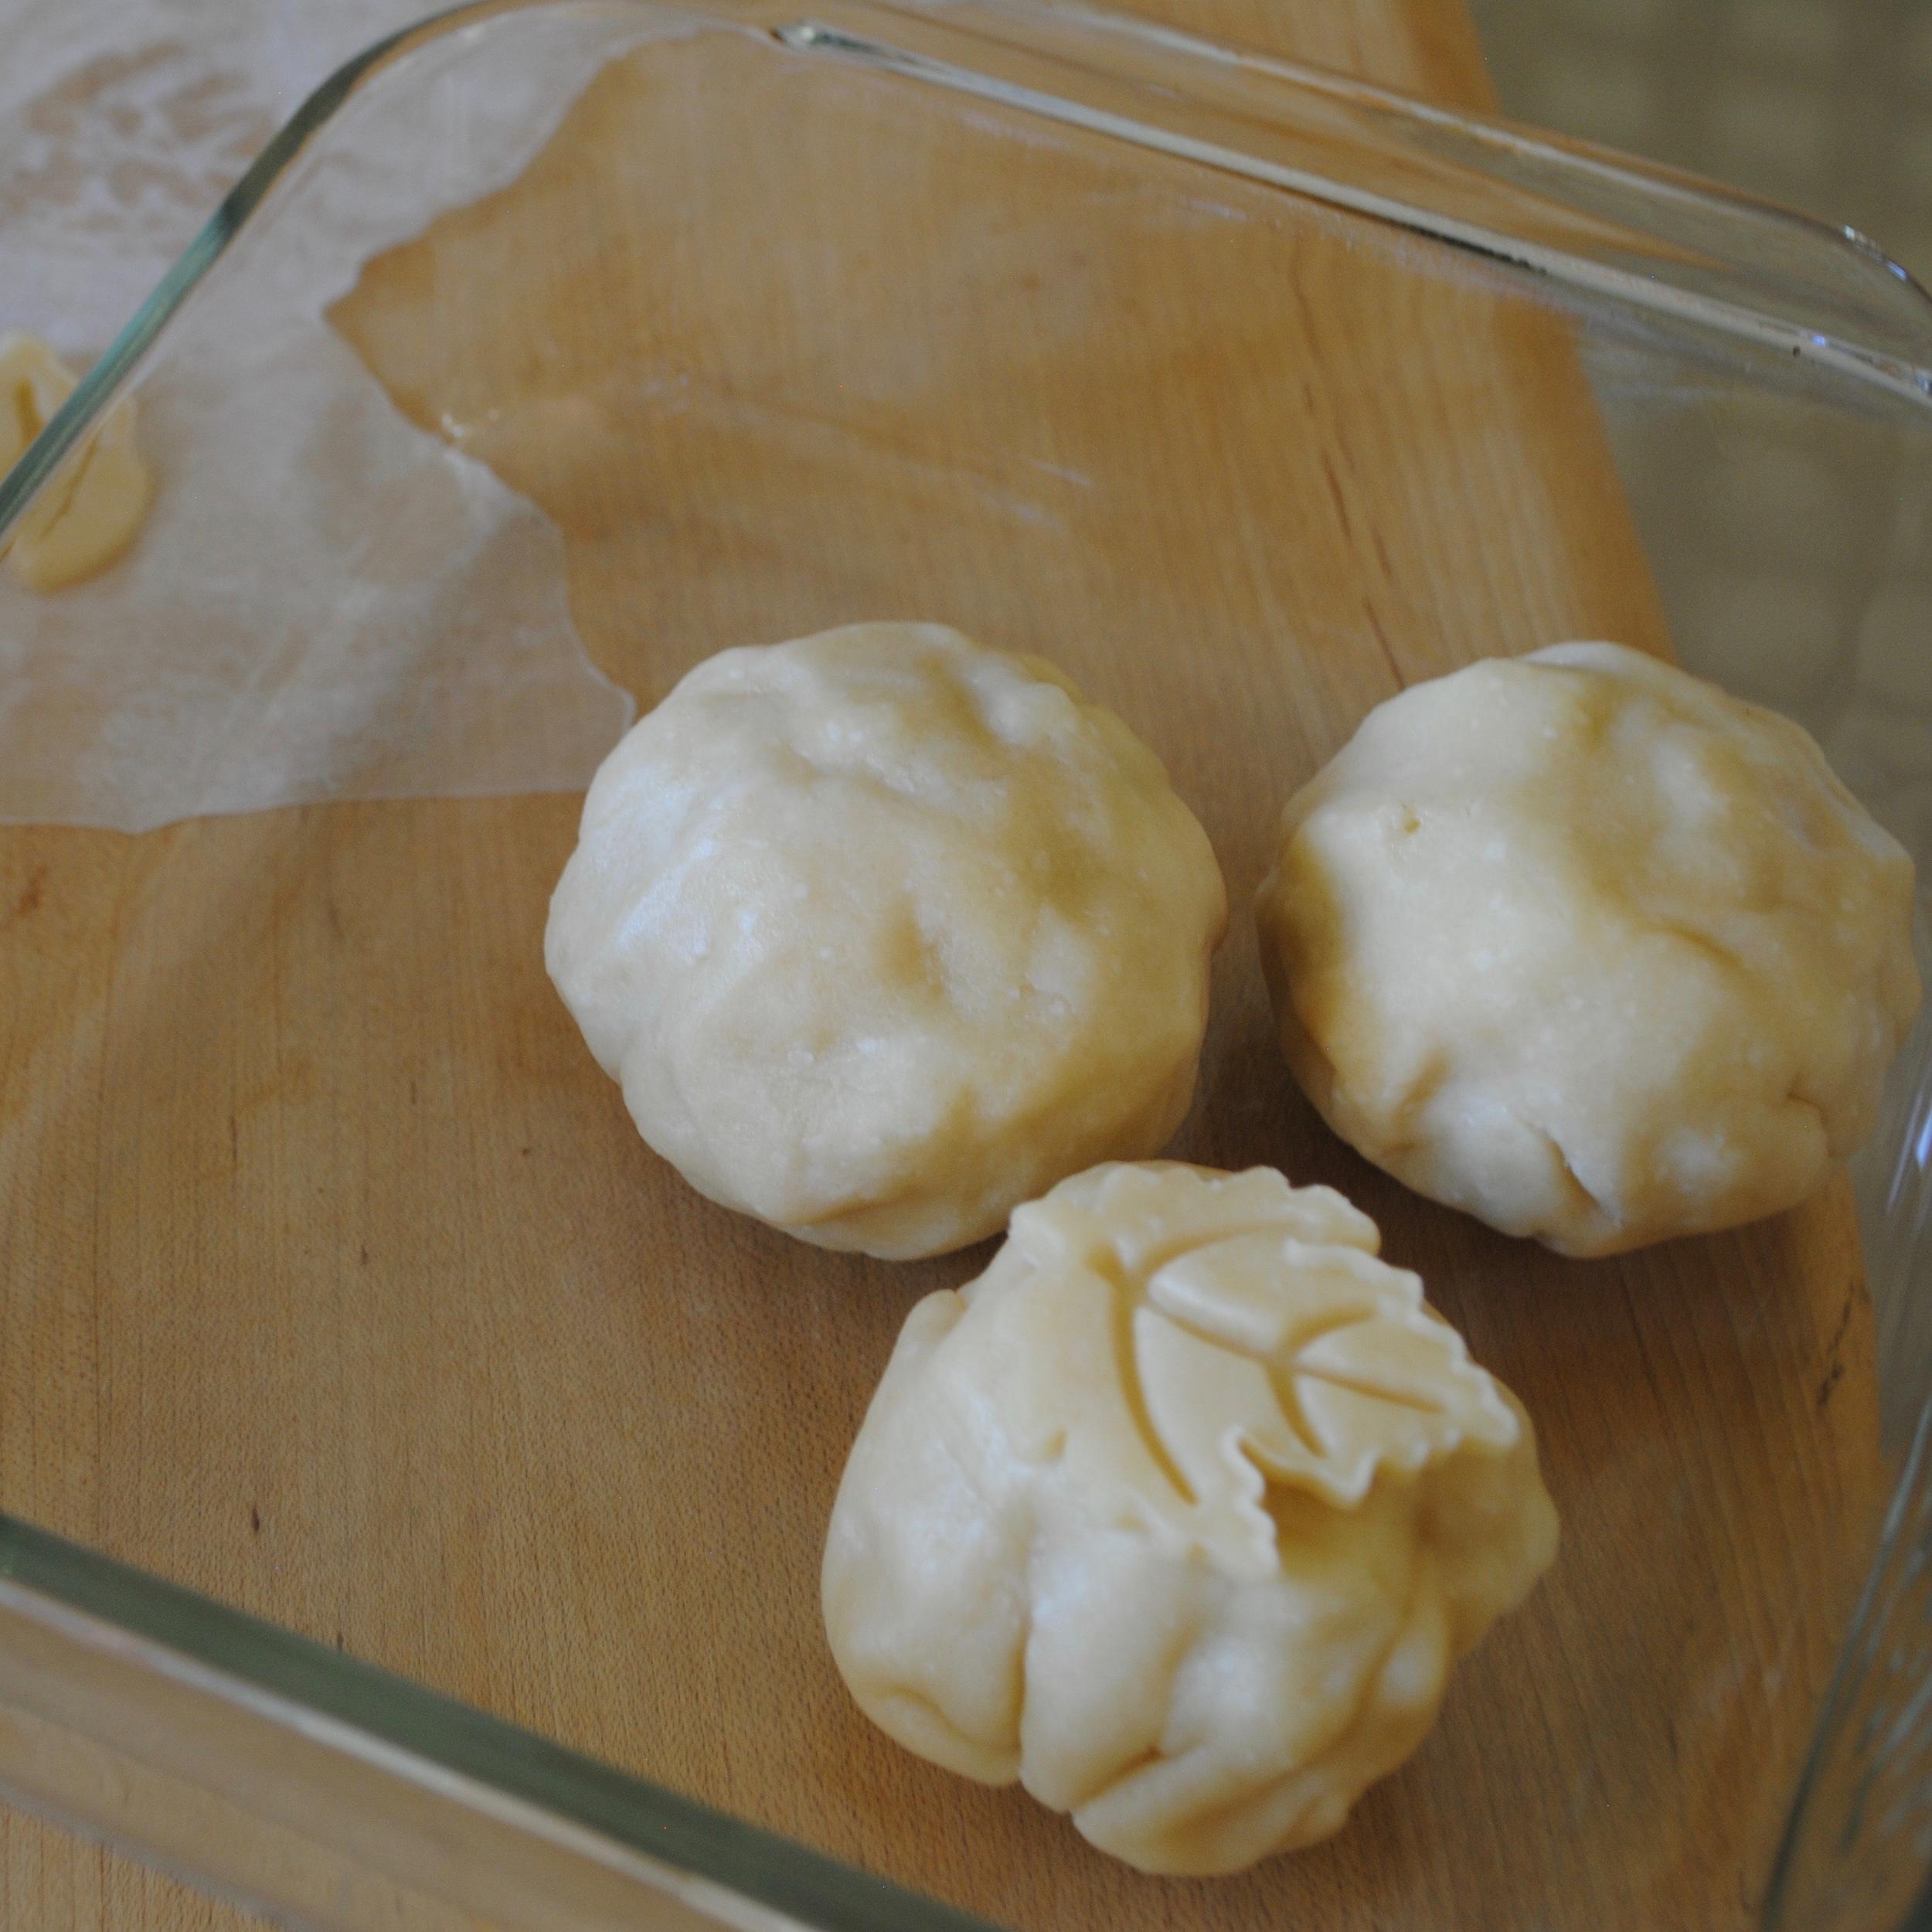 Place dumplings in pan